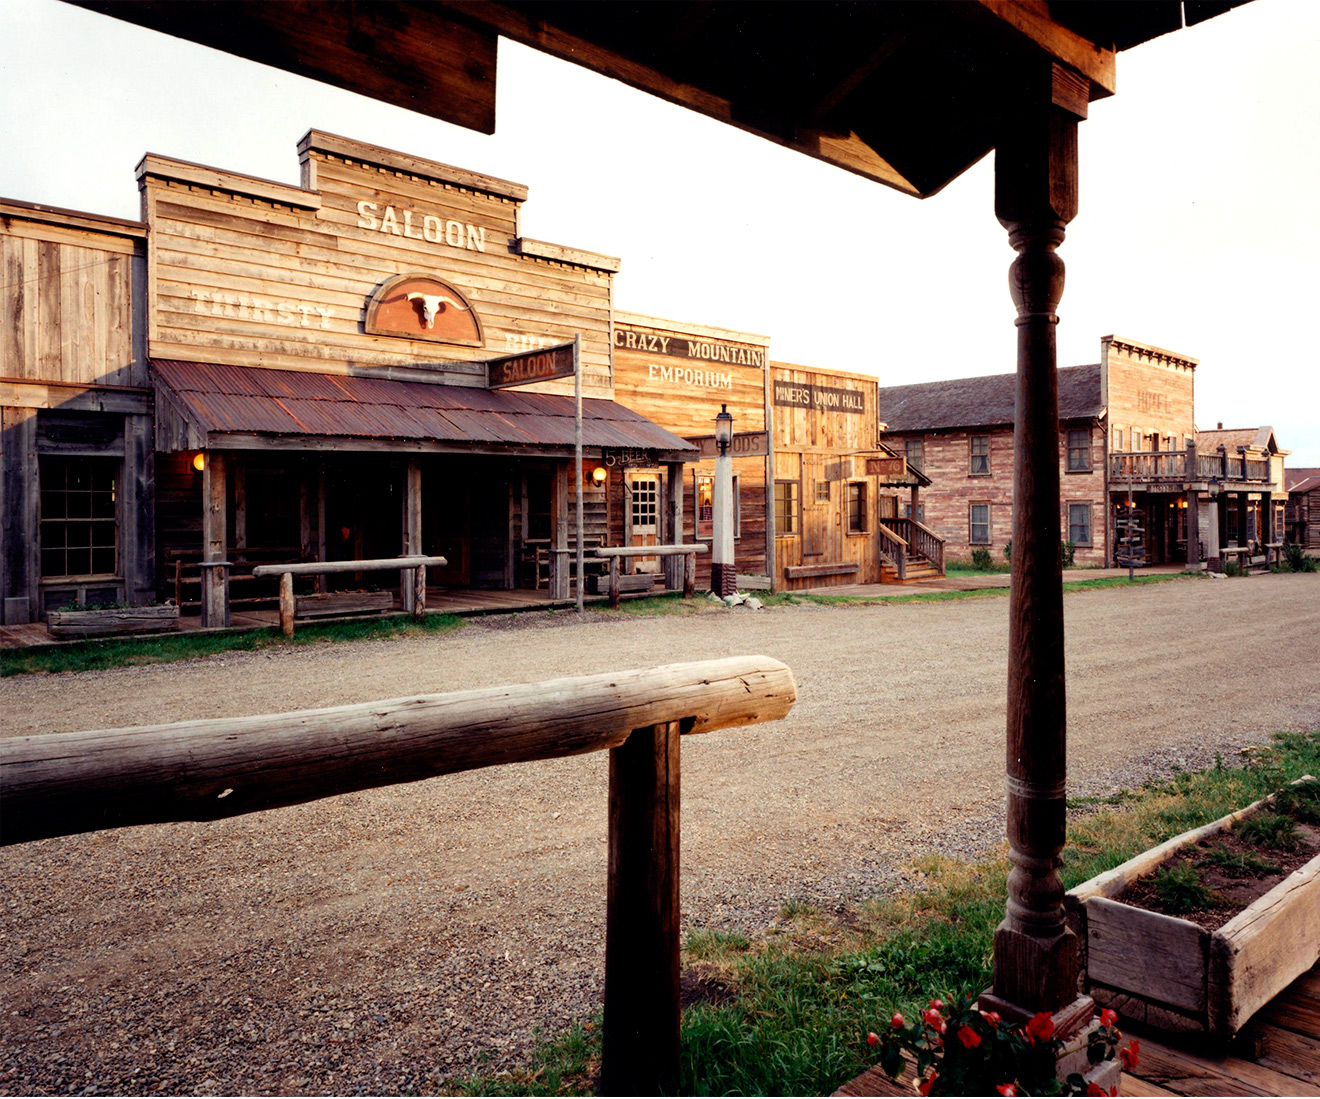 Saloon-Street-View.jpg